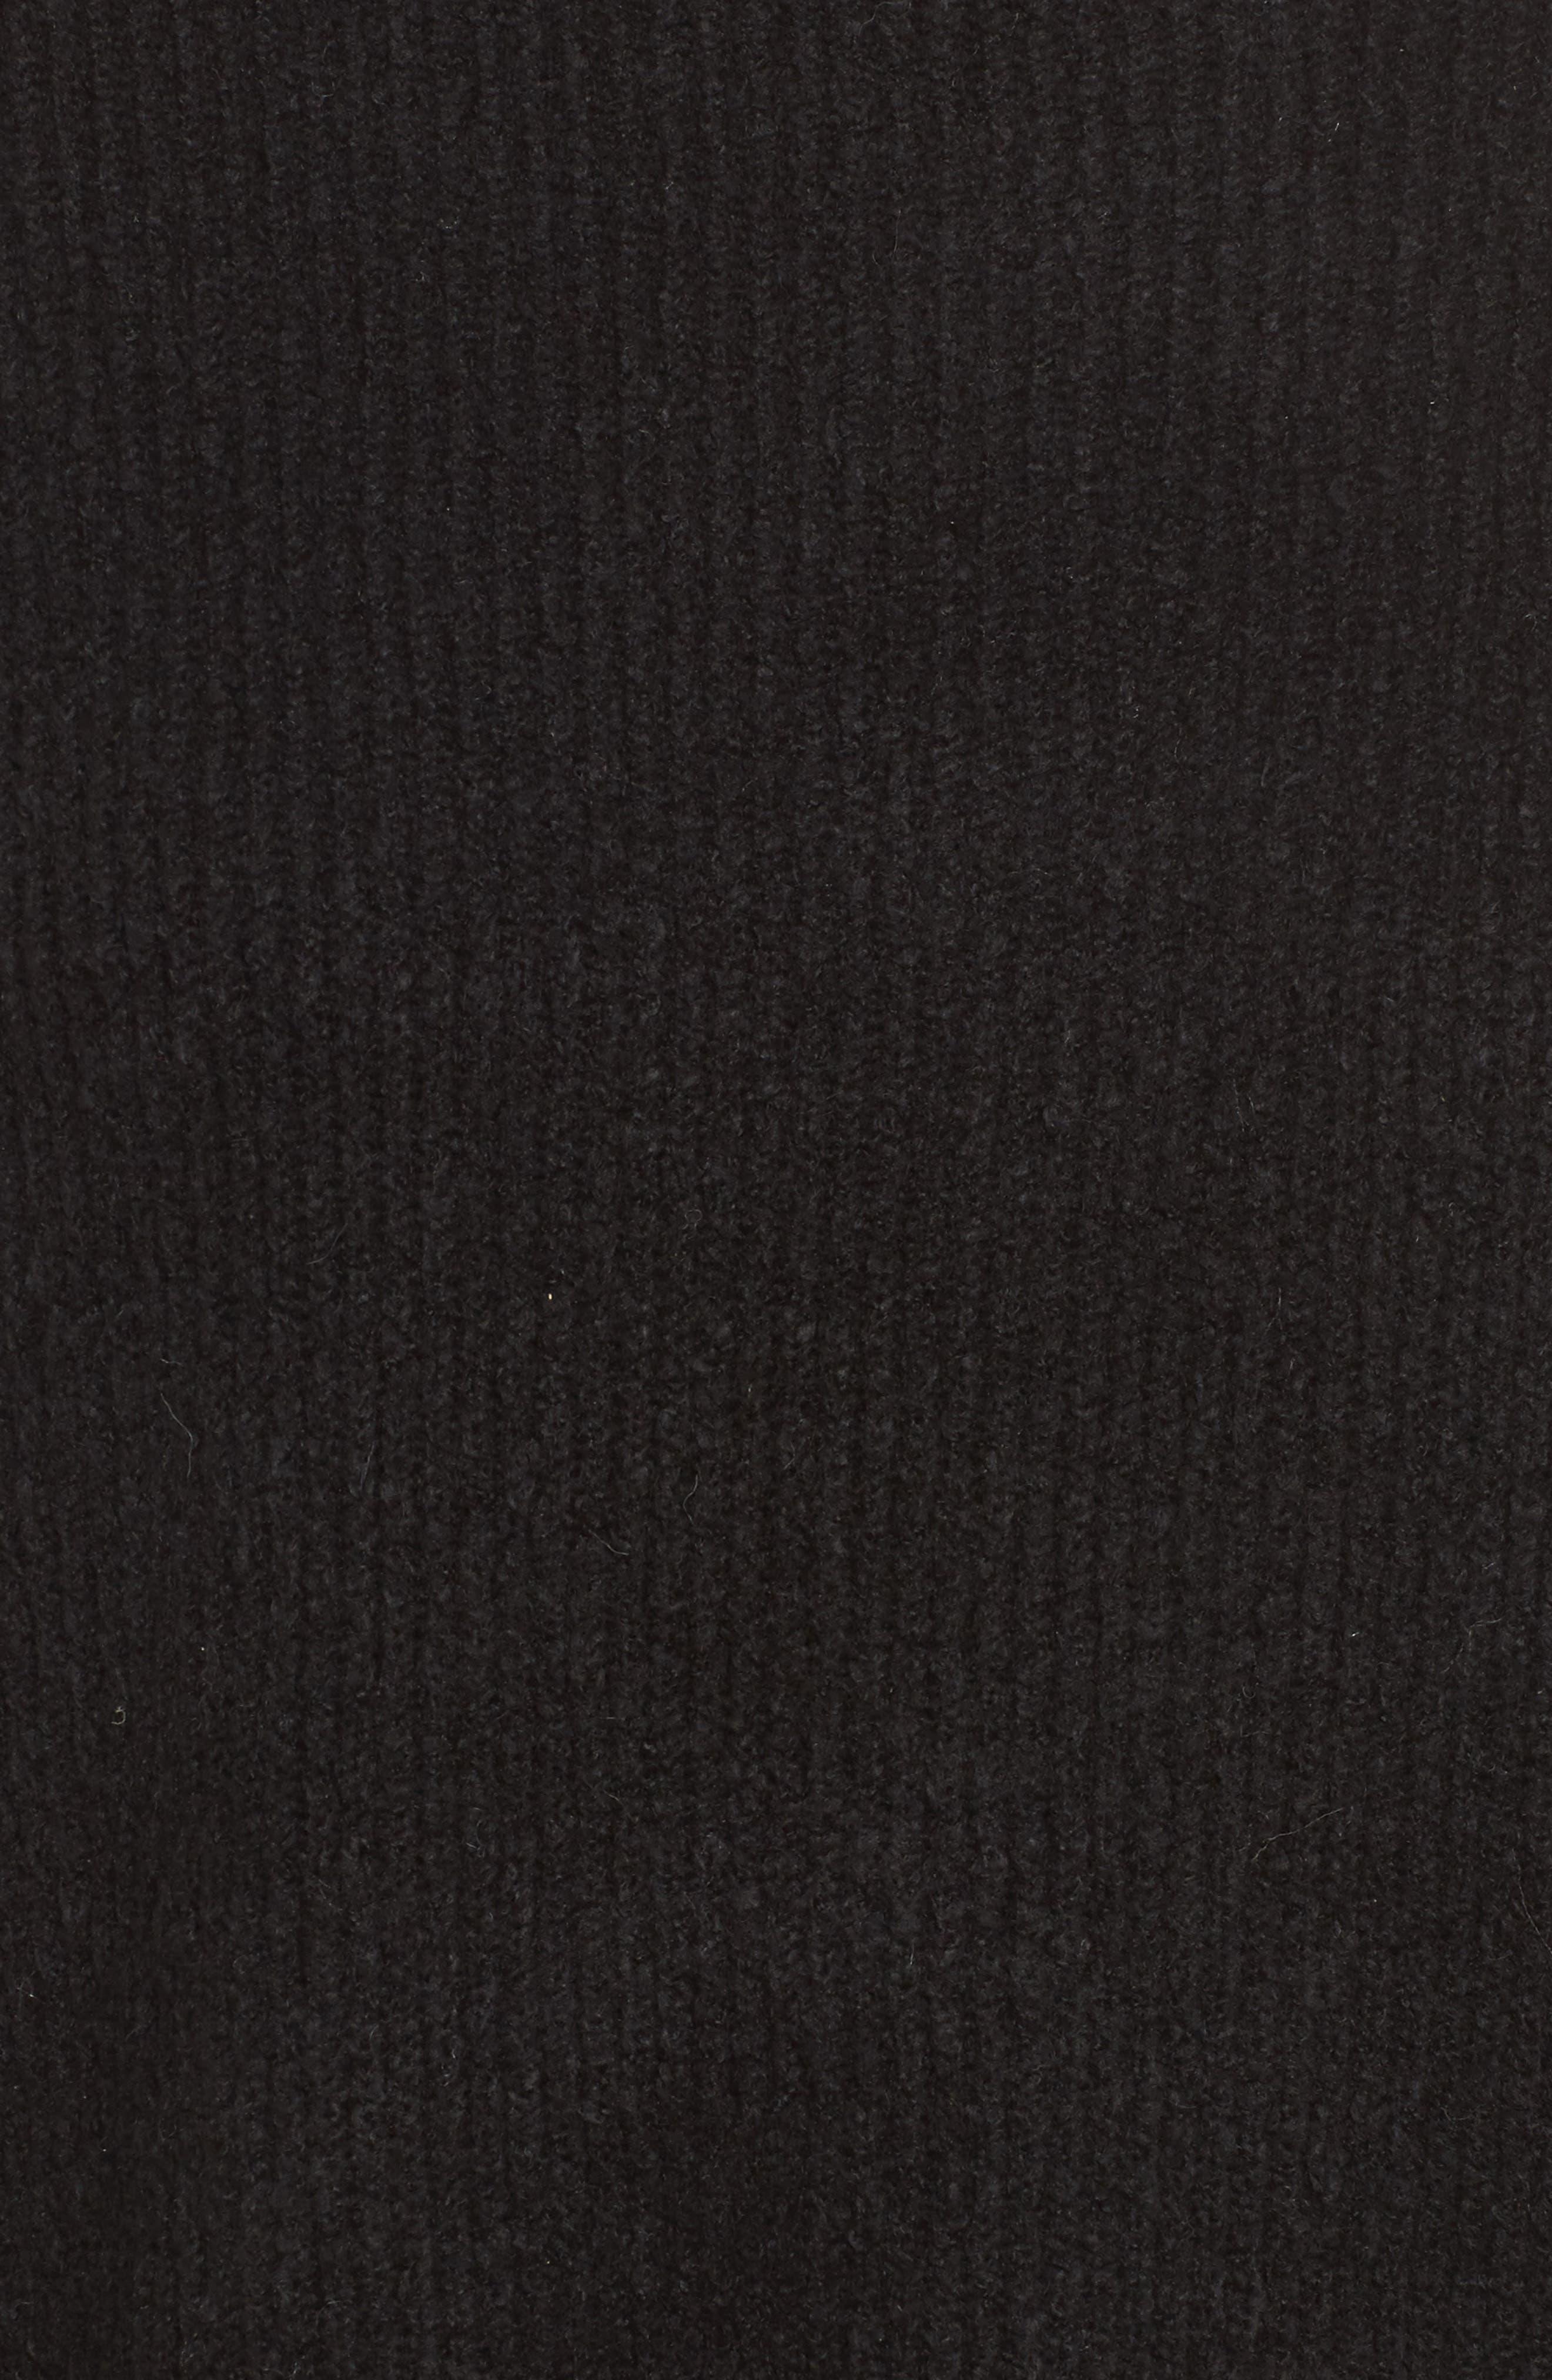 Urban Flossy Turtleneck Sweater,                             Alternate thumbnail 5, color,                             001